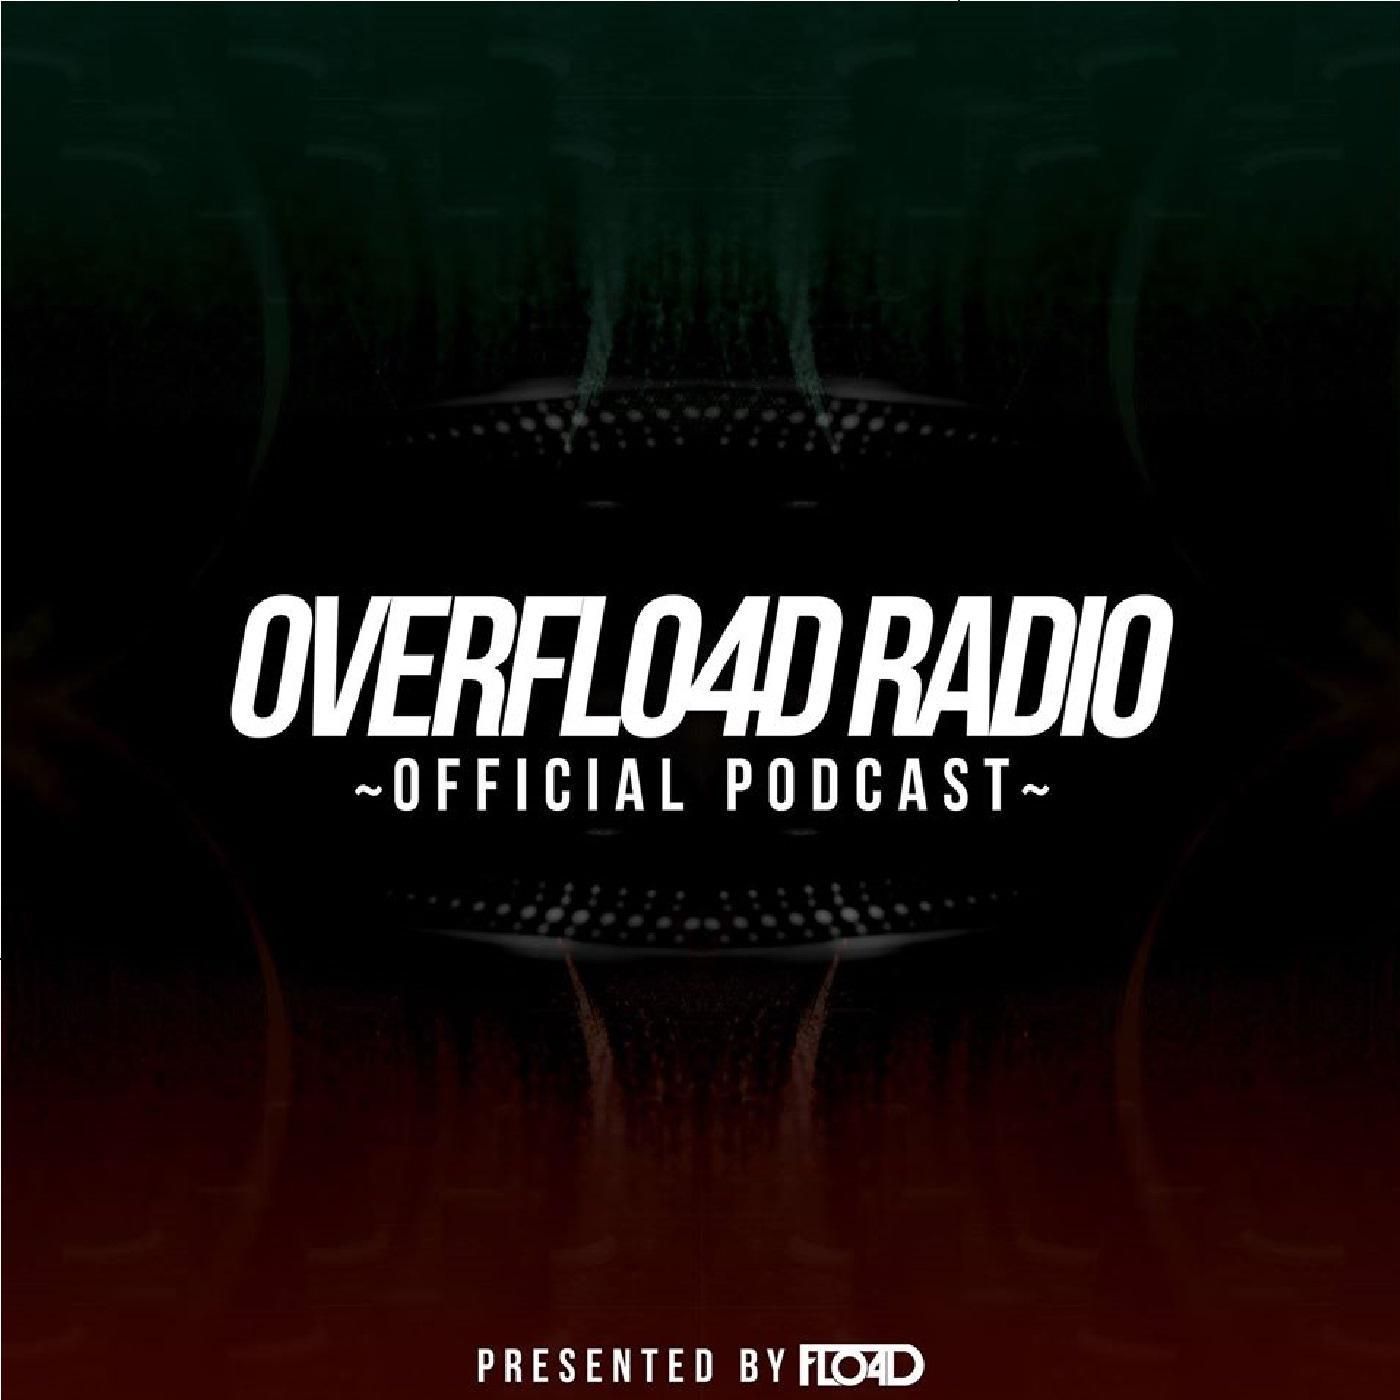 OVERFLO4D Radio by FLO4D